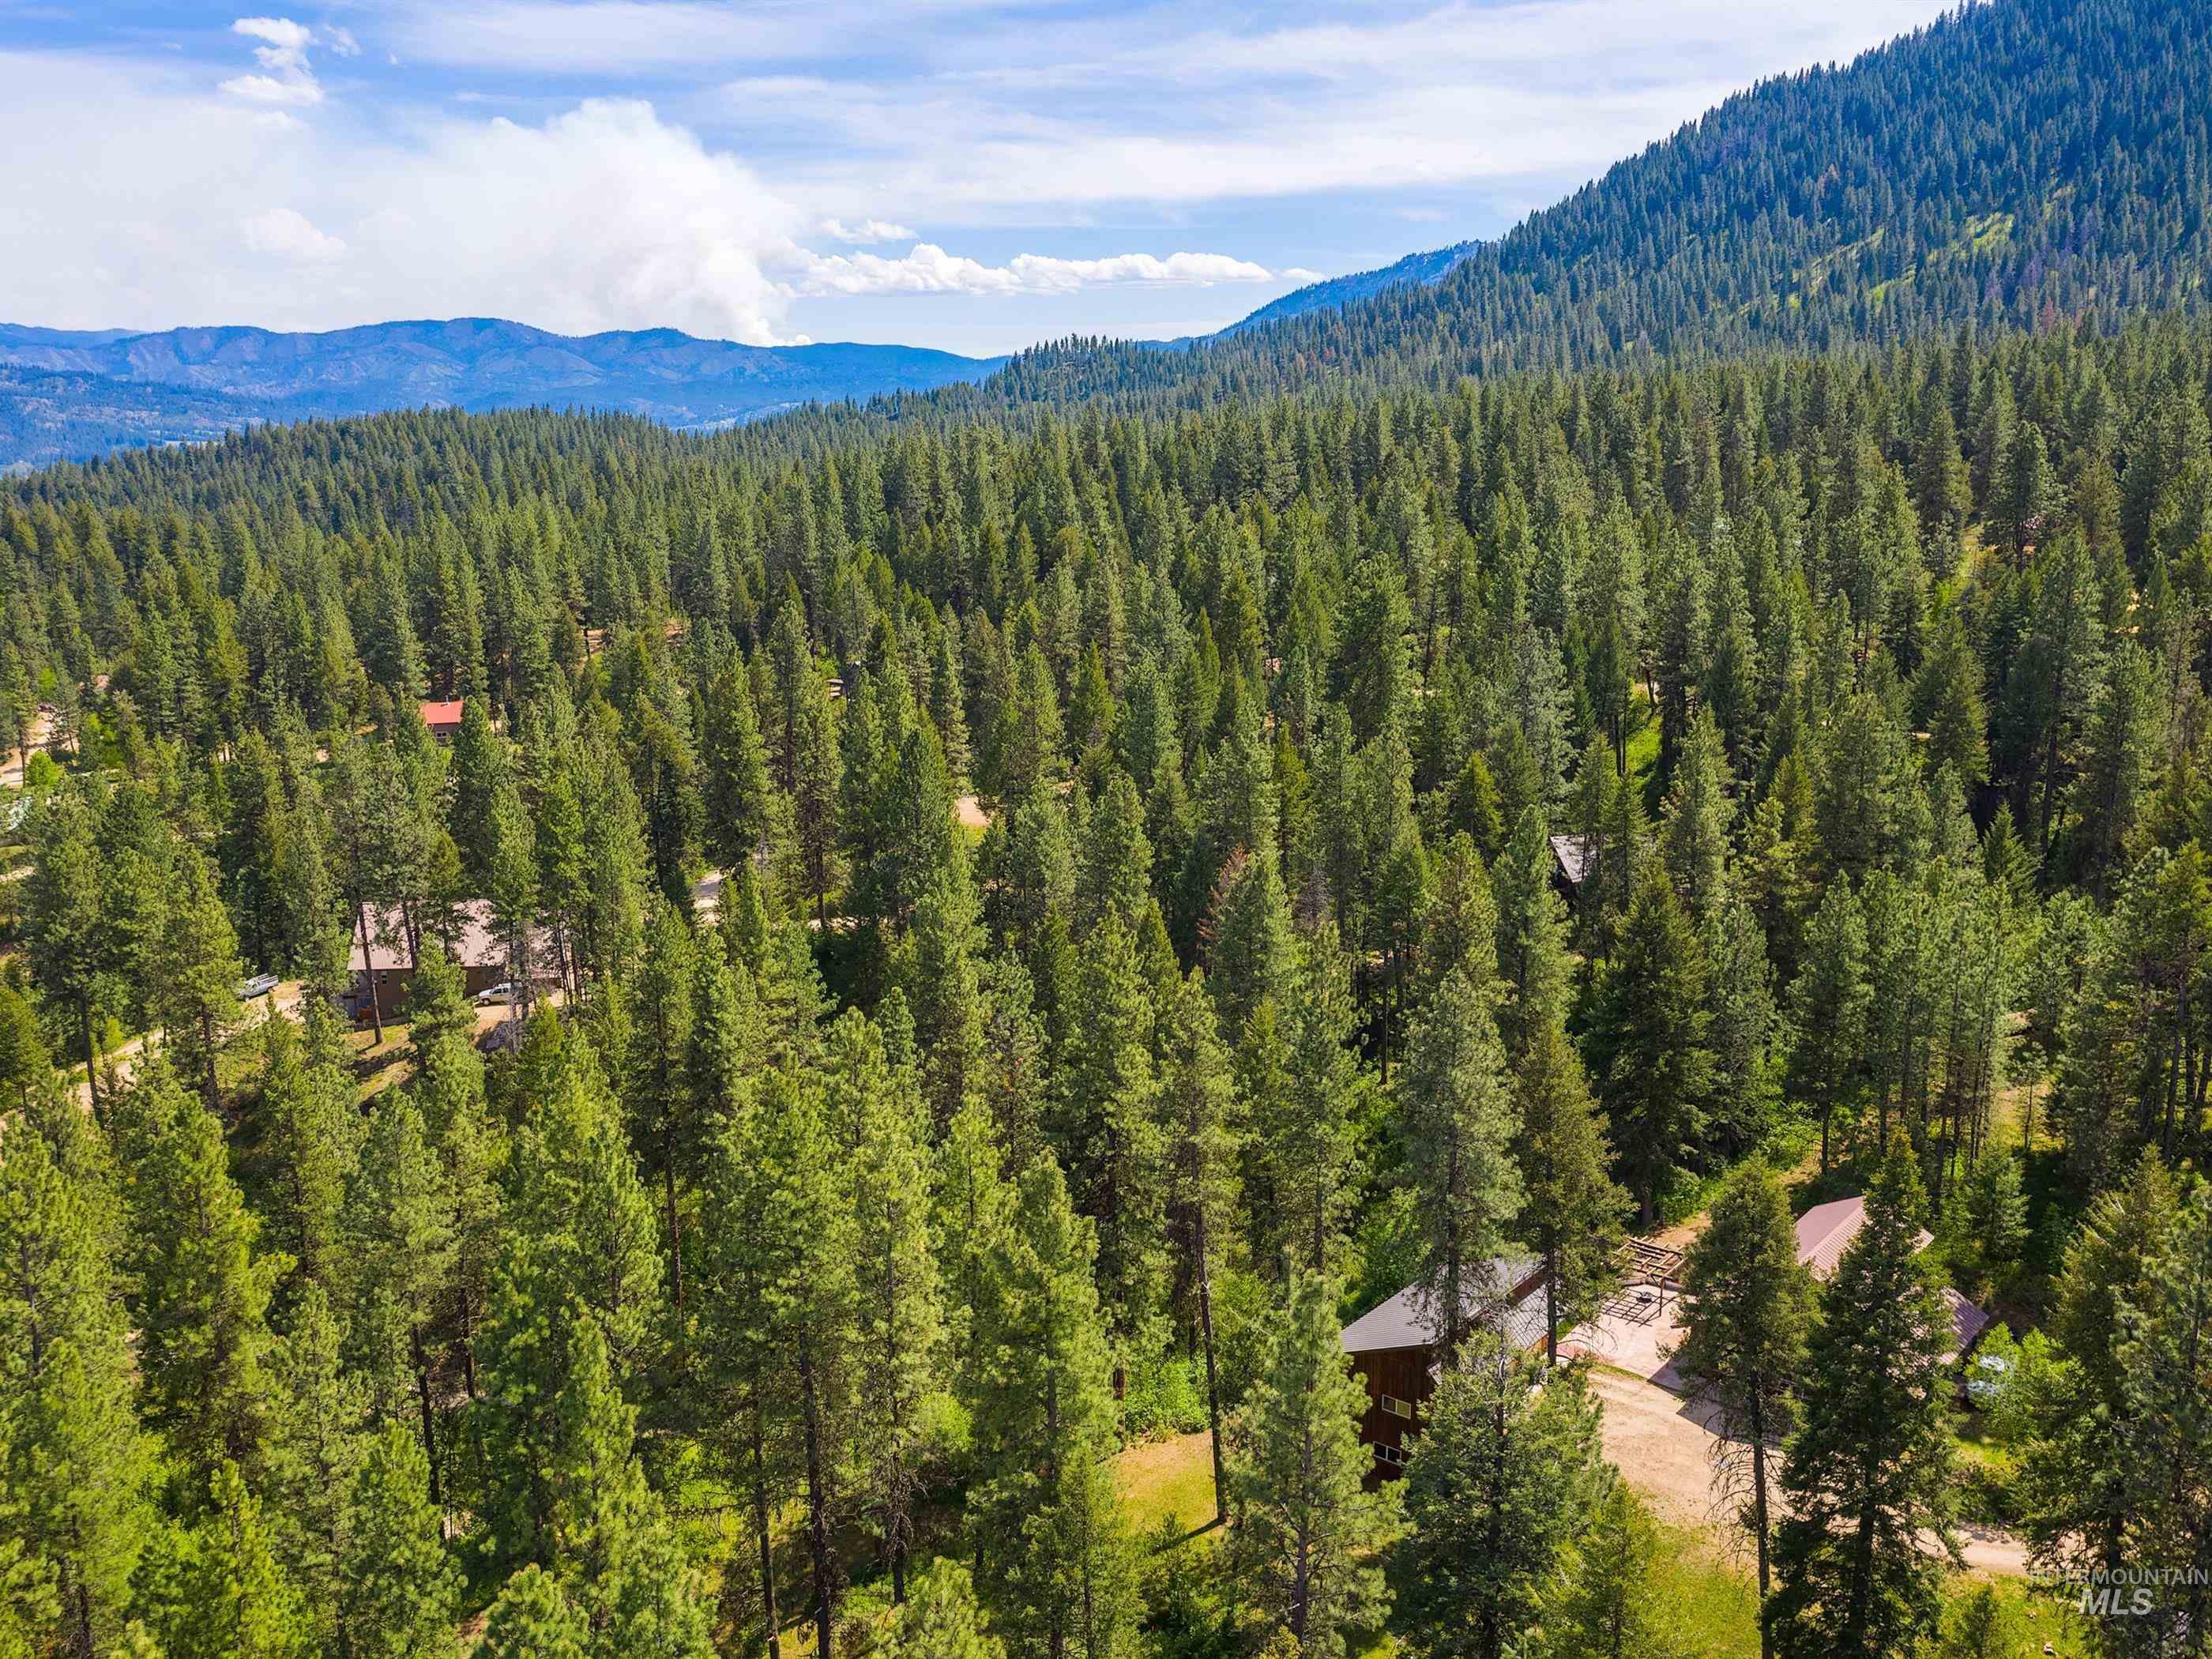 Tbd Deer Trail (lot 21) Property Photo